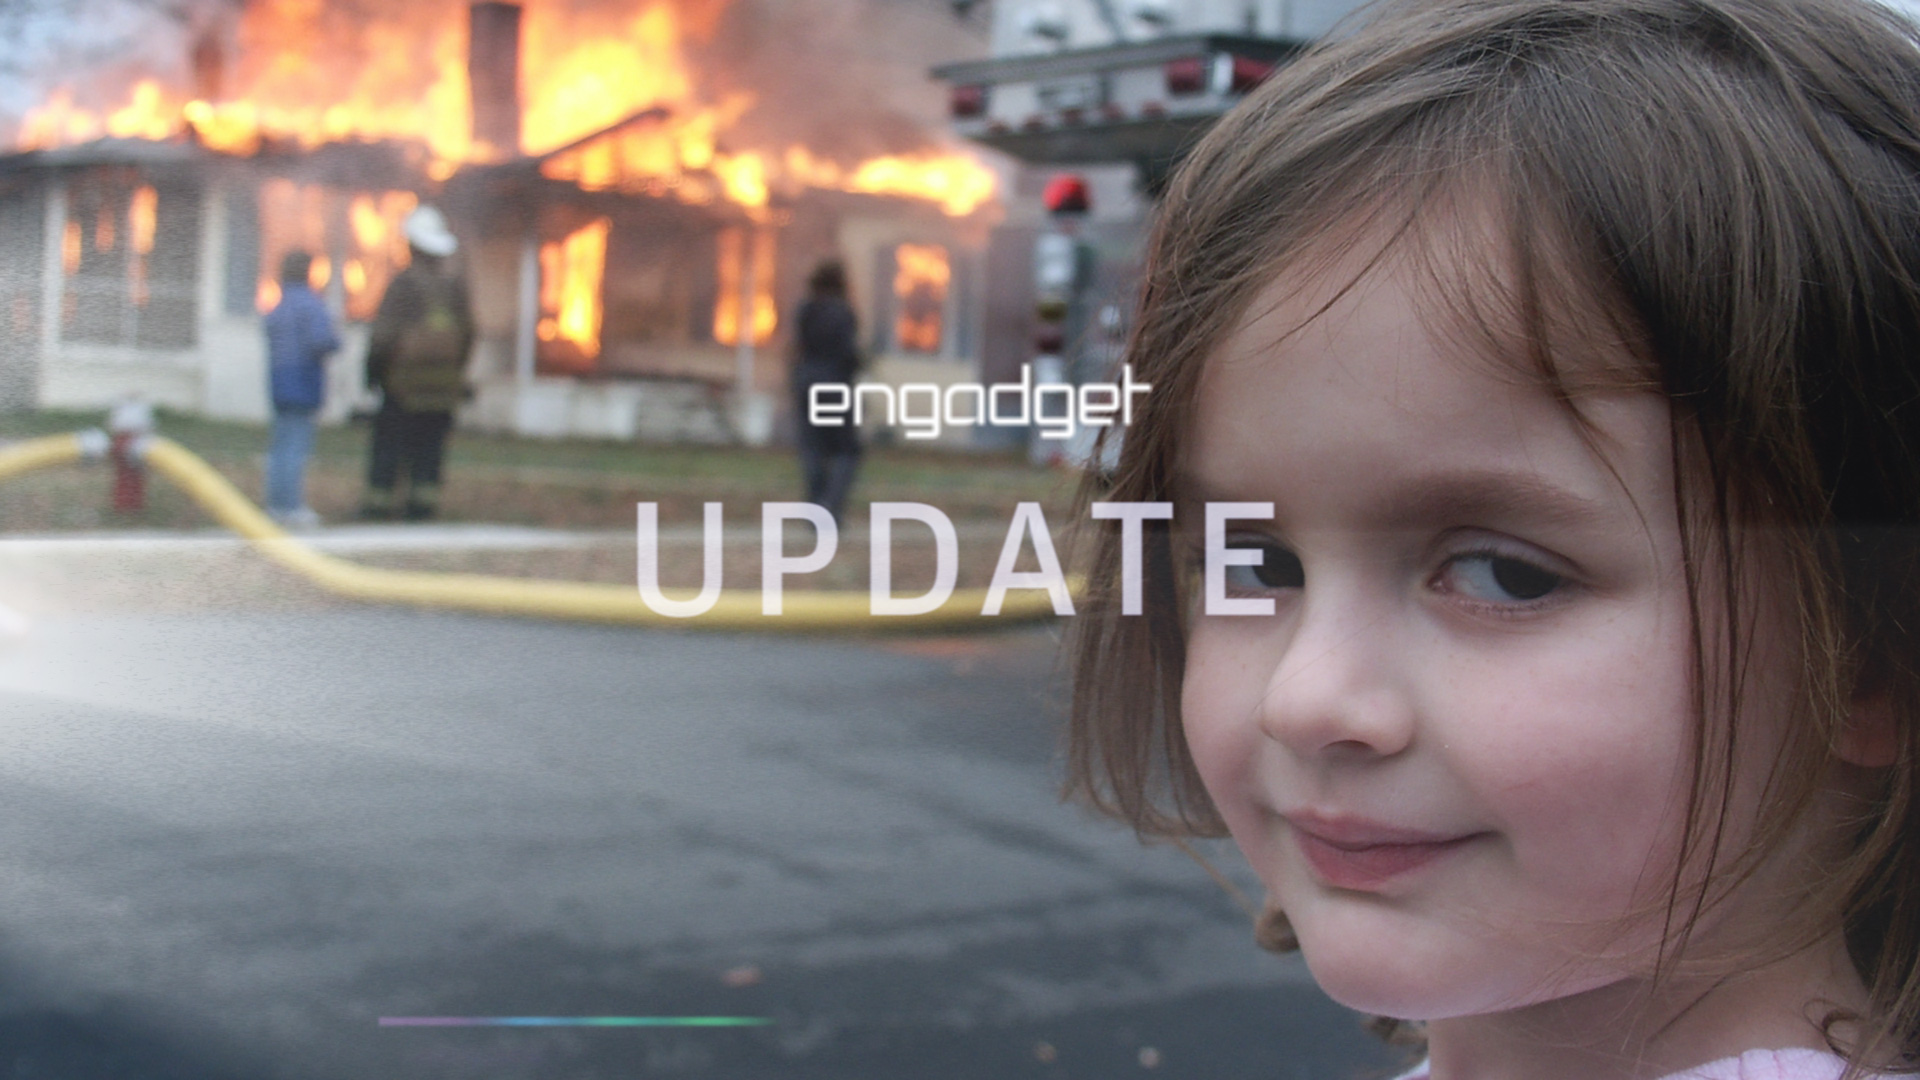 Engadget Update EP98